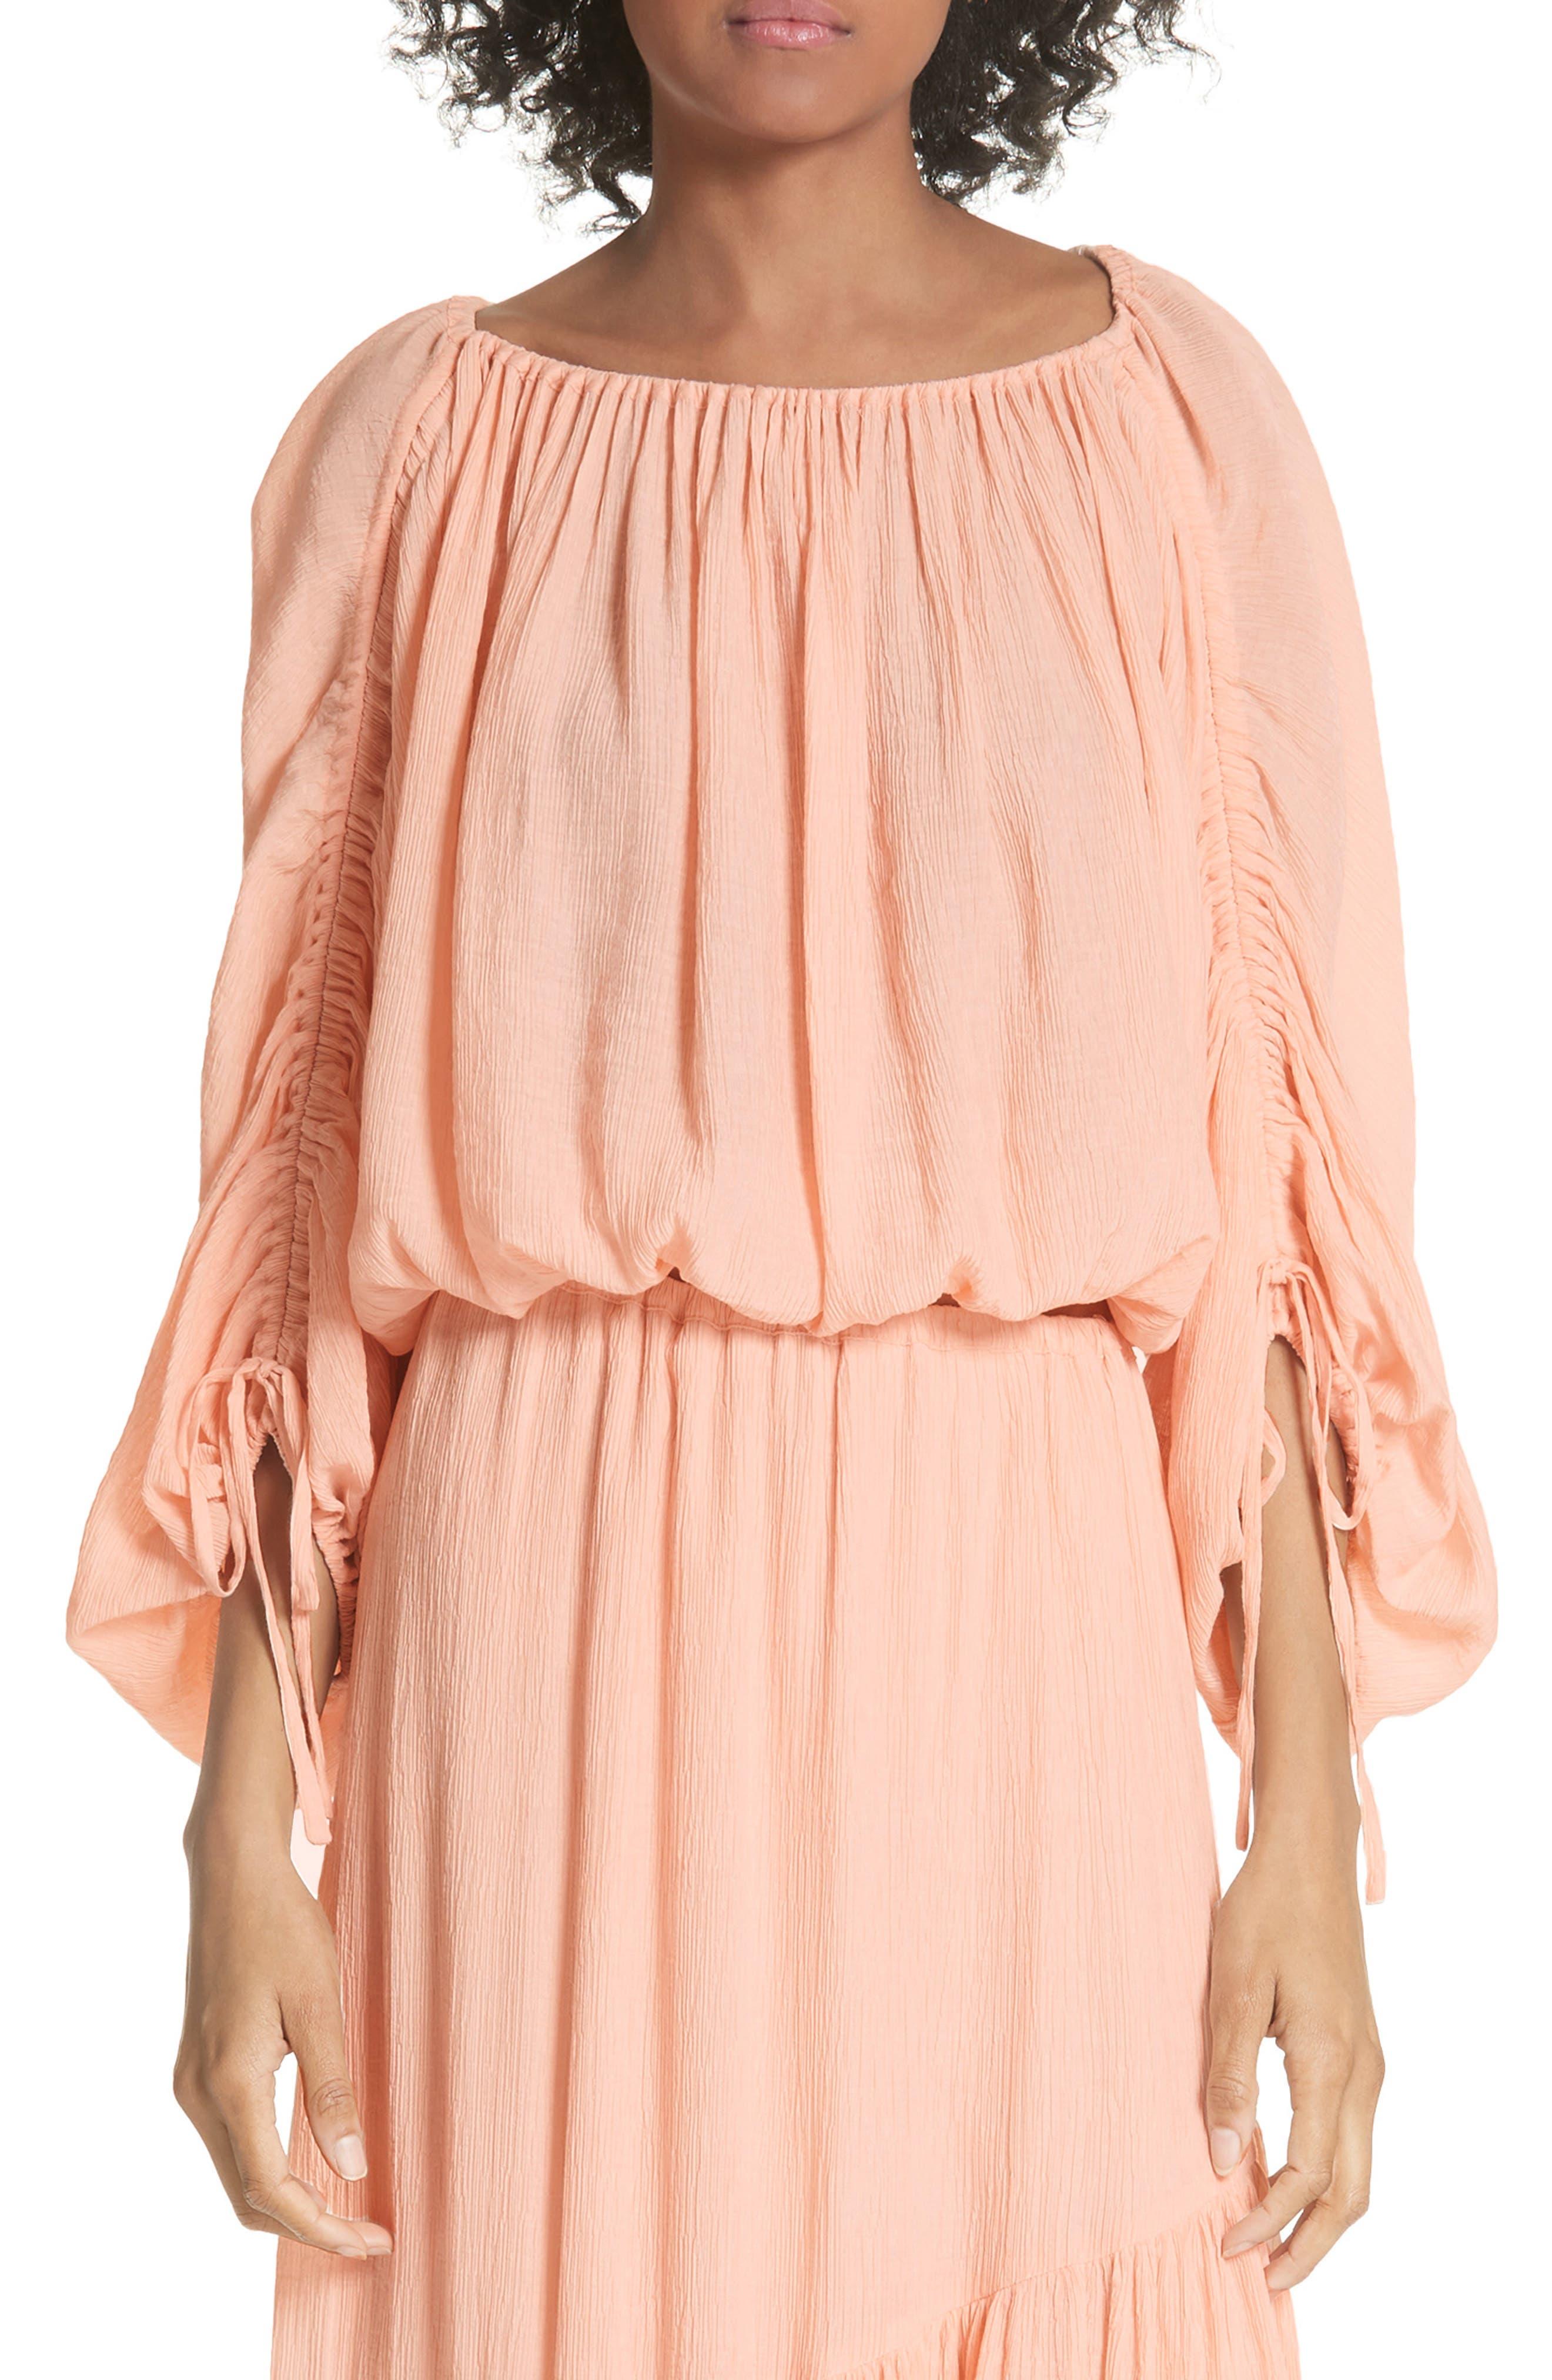 Elazara Ruched Sleeve Peasant Top,                         Main,                         color,